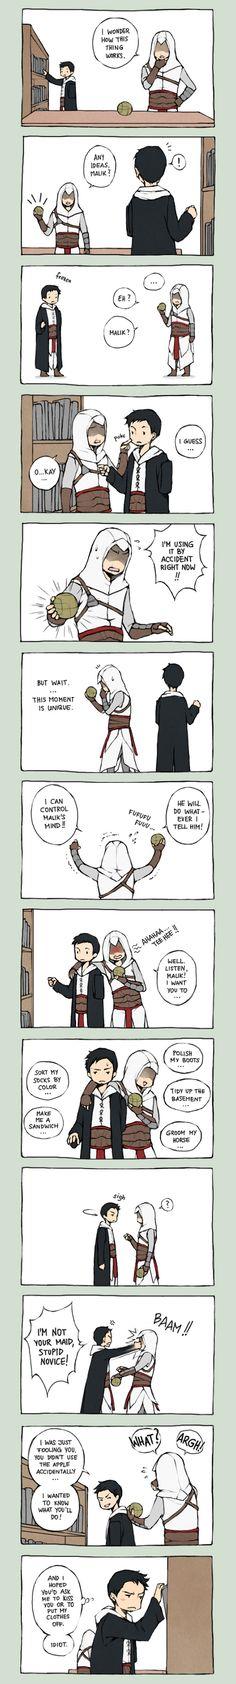 Altair x Malik -->Assassin's Creed by Lanimalu